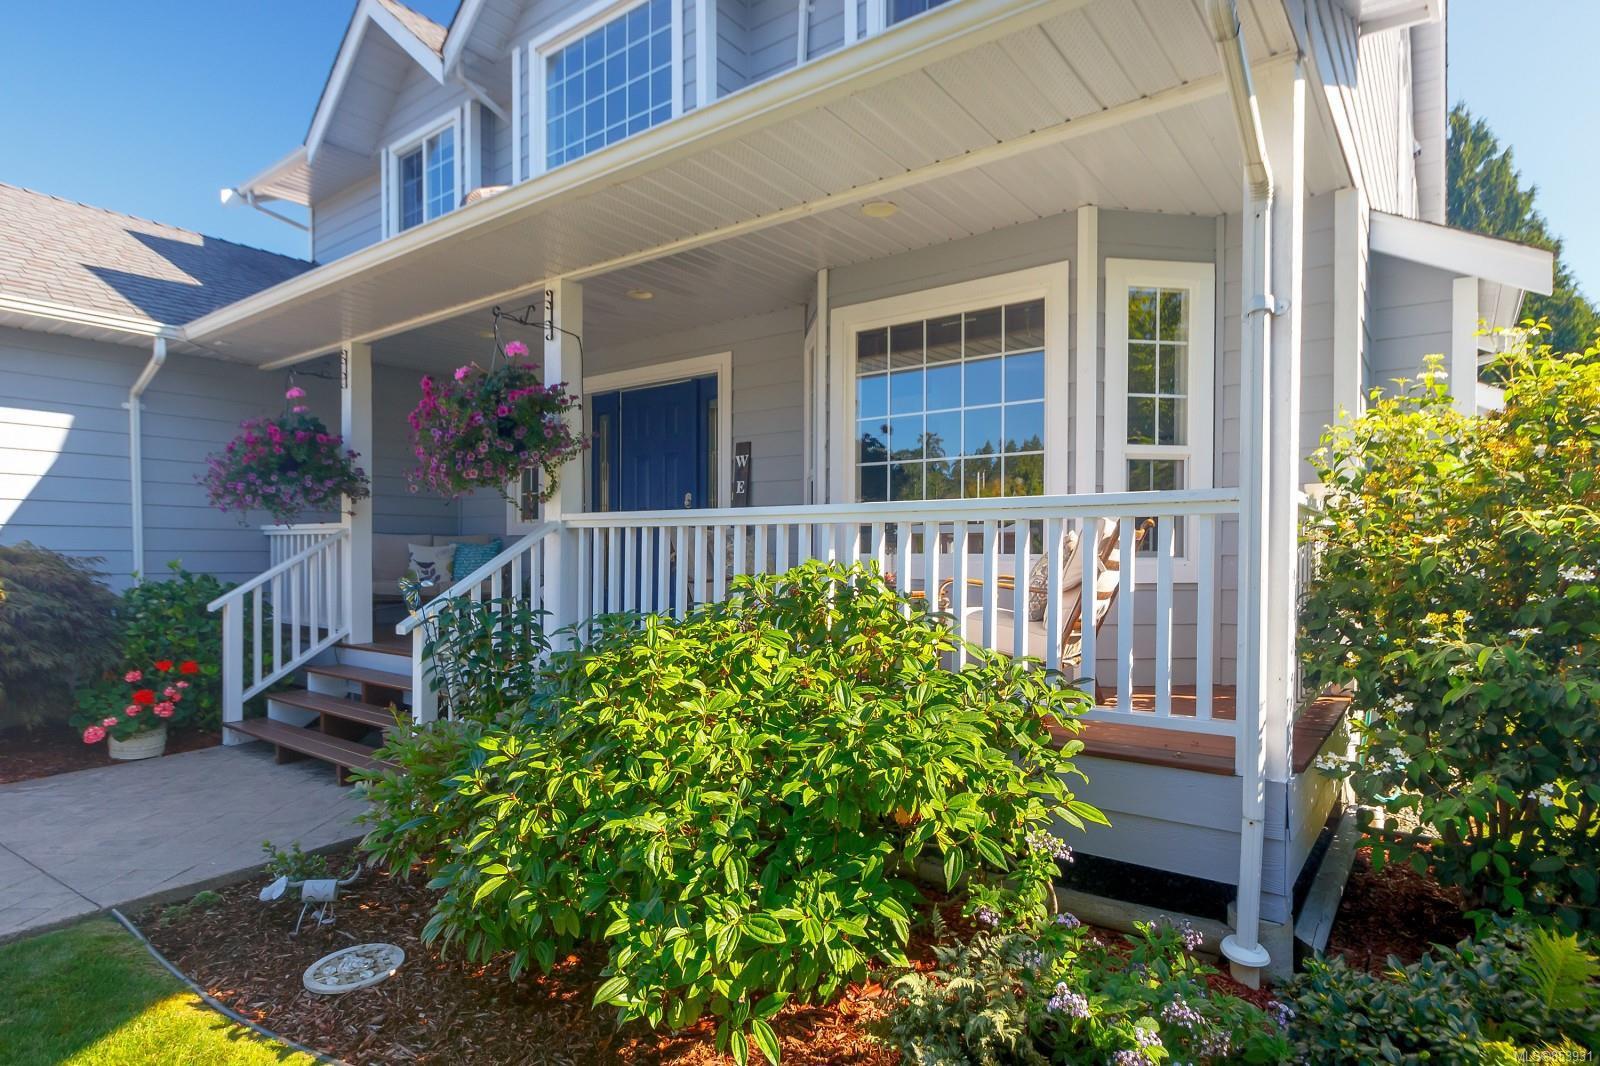 Photo 26: Photos: 2456 Timbercrest Dr in : Du East Duncan House for sale (Duncan)  : MLS®# 853931